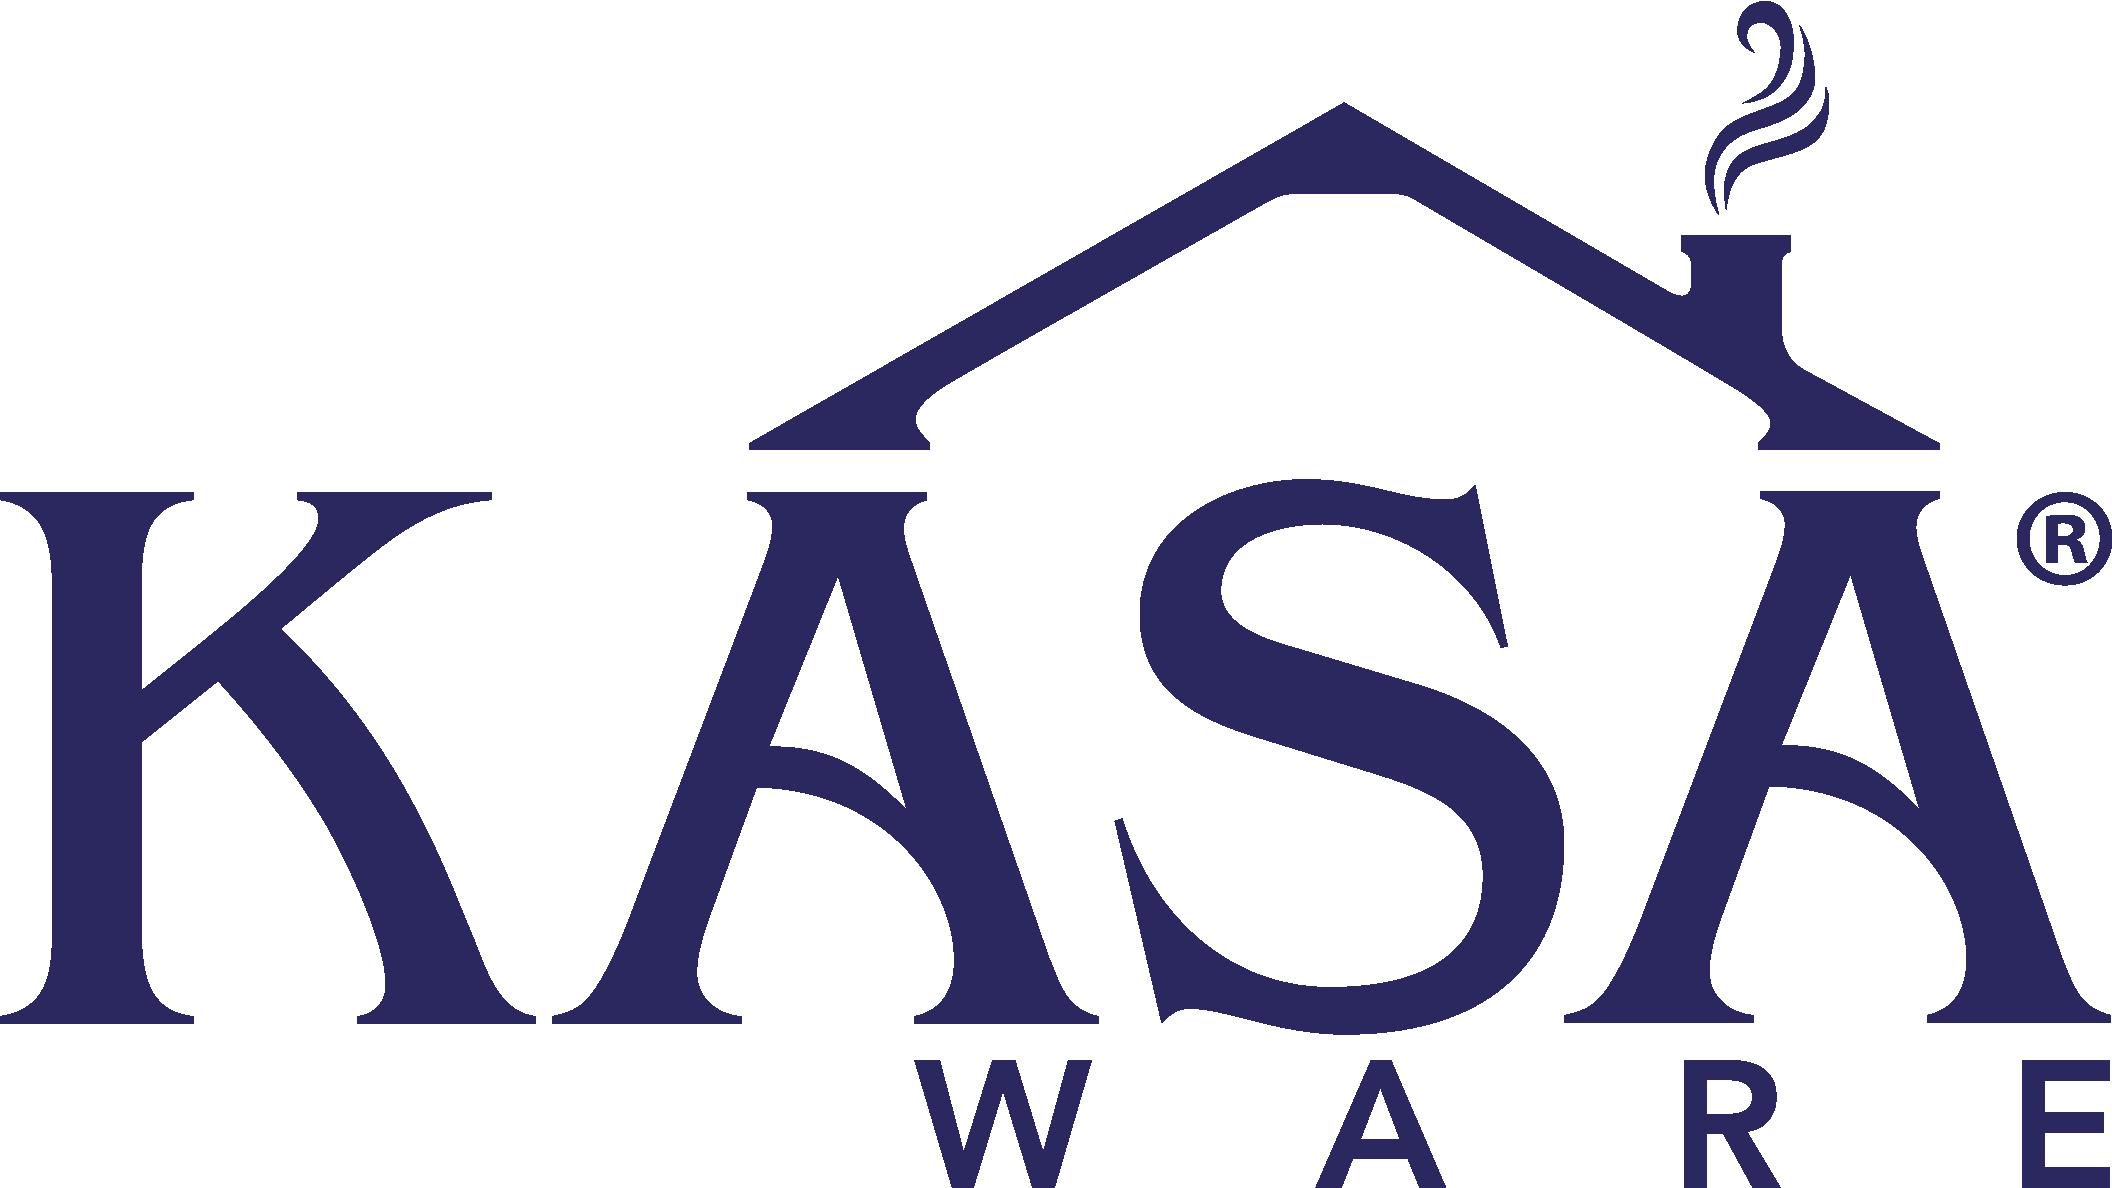 Hardware Resources DBA Kasaware